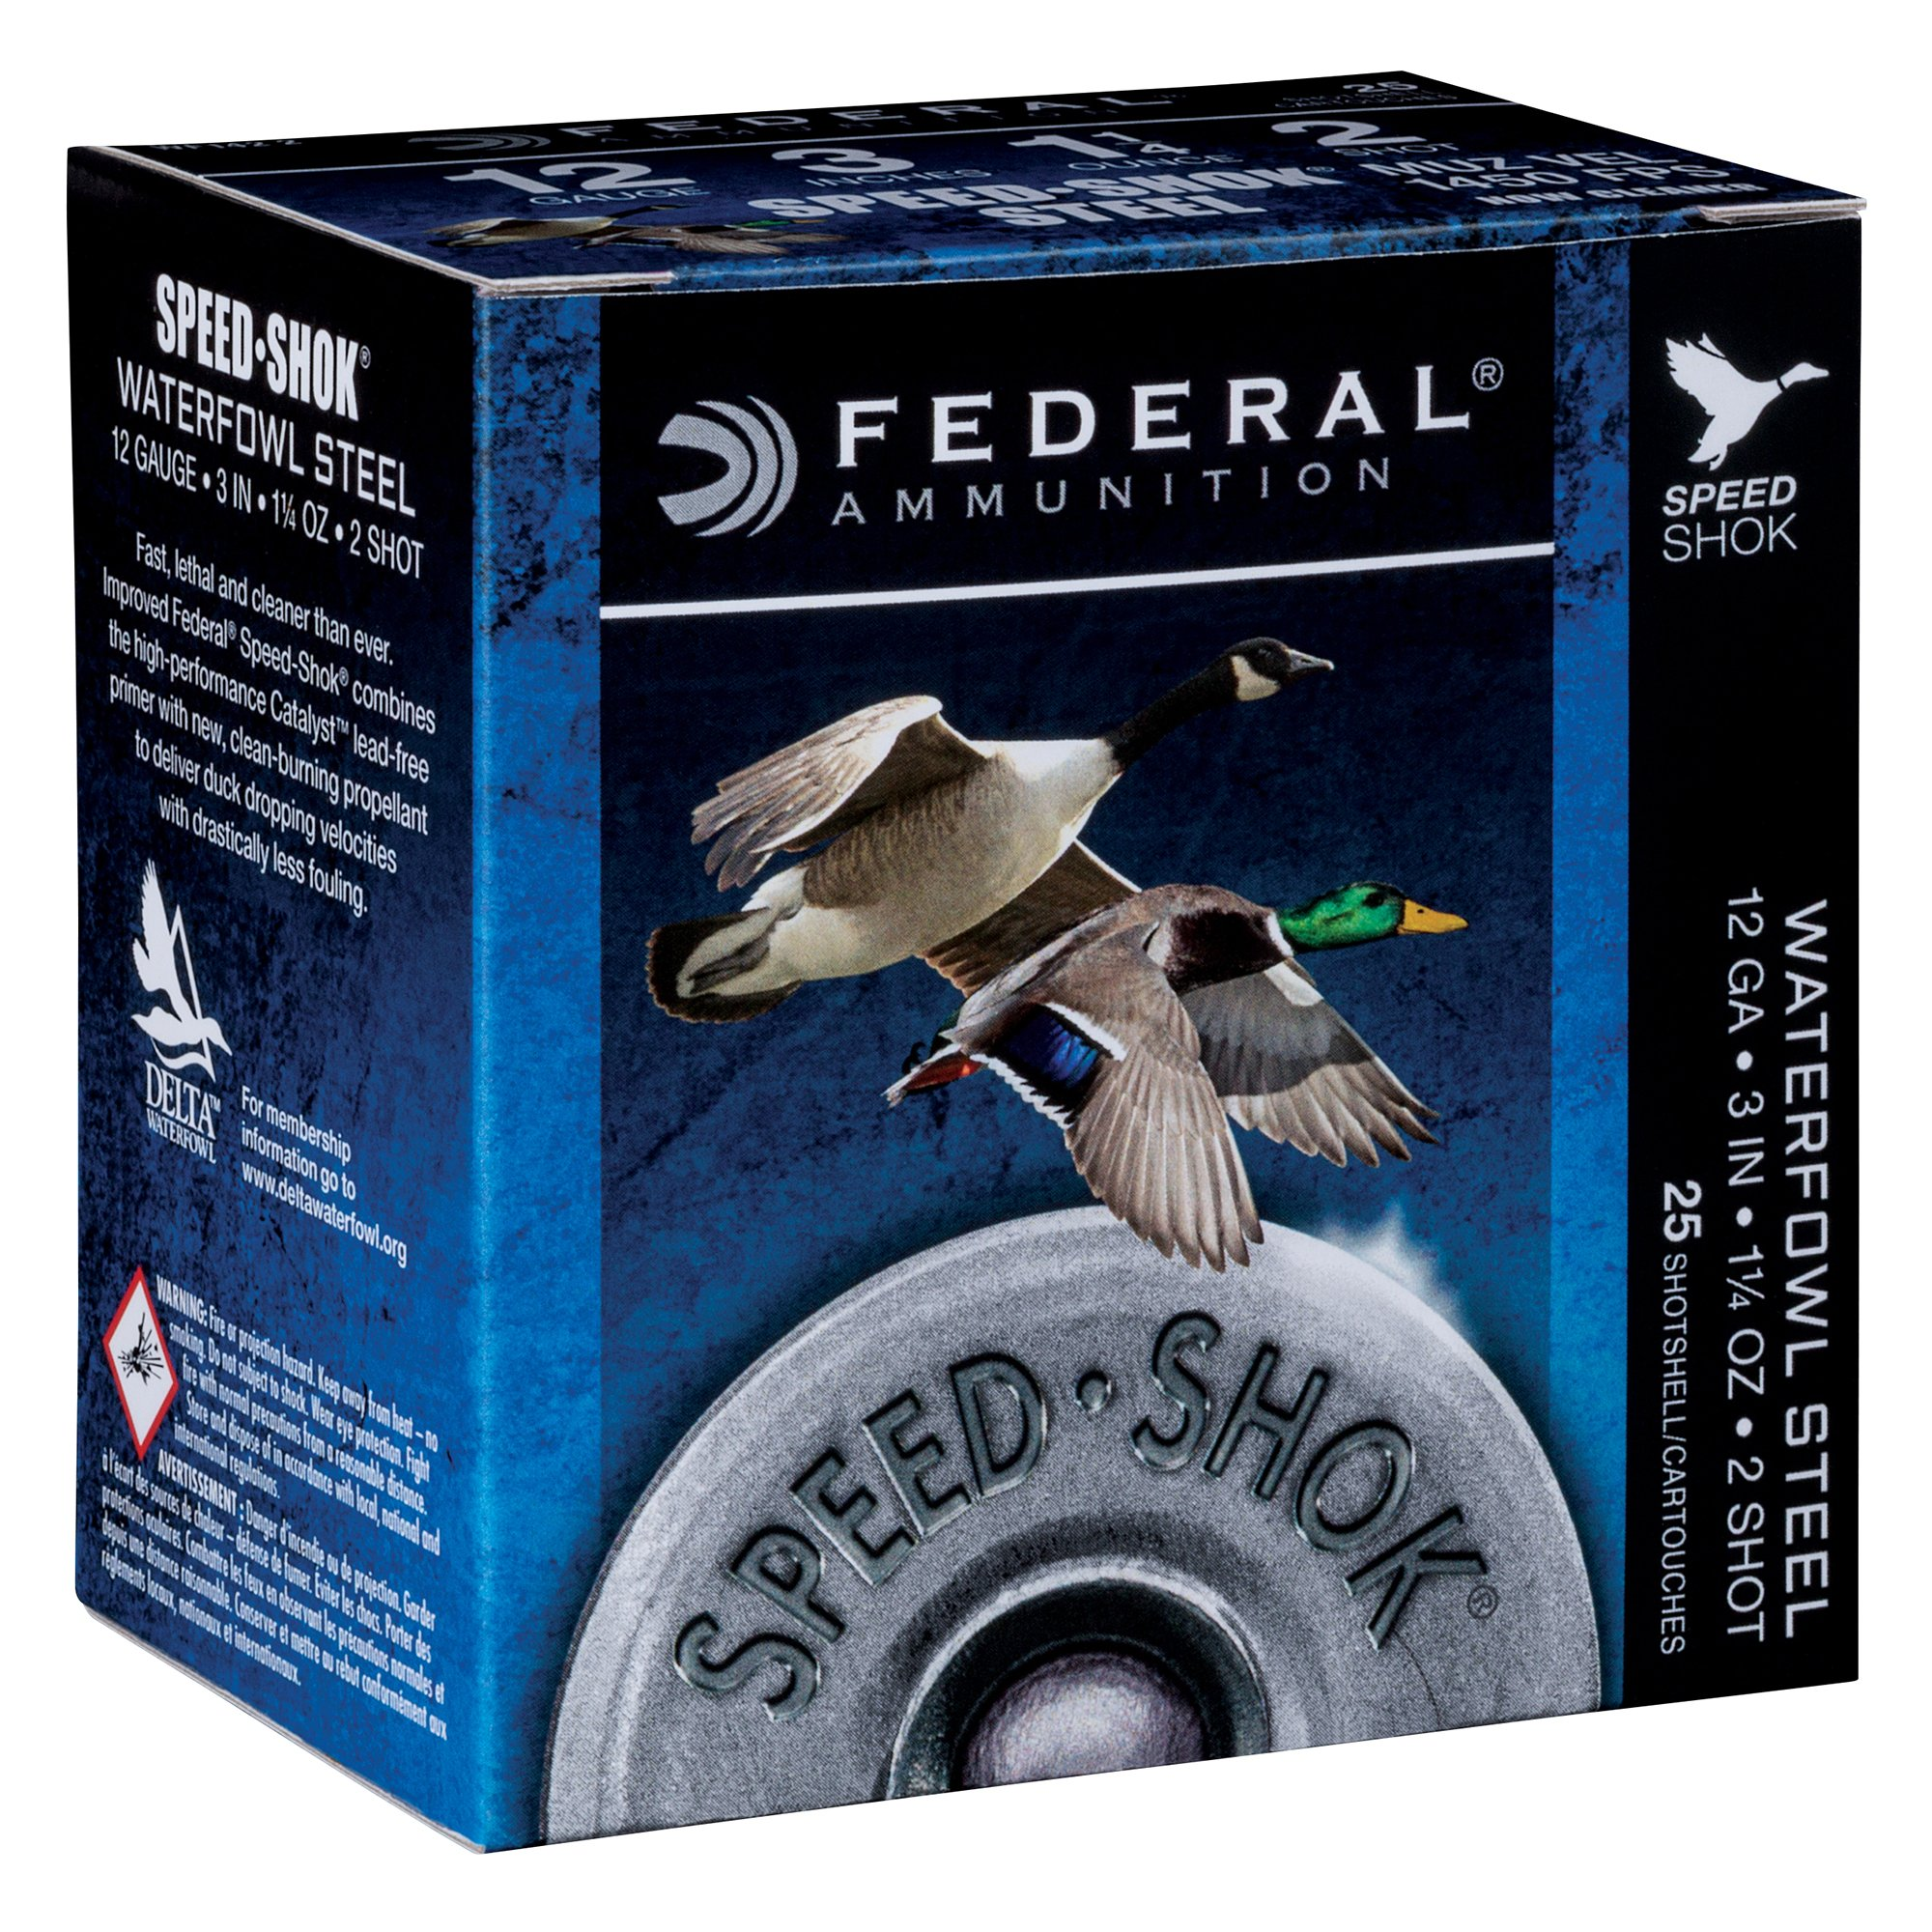 Federal Premium Speed-Shok Steel Waterfowl Loads, 12-ga, 3″, 1-1/4 oz, 4